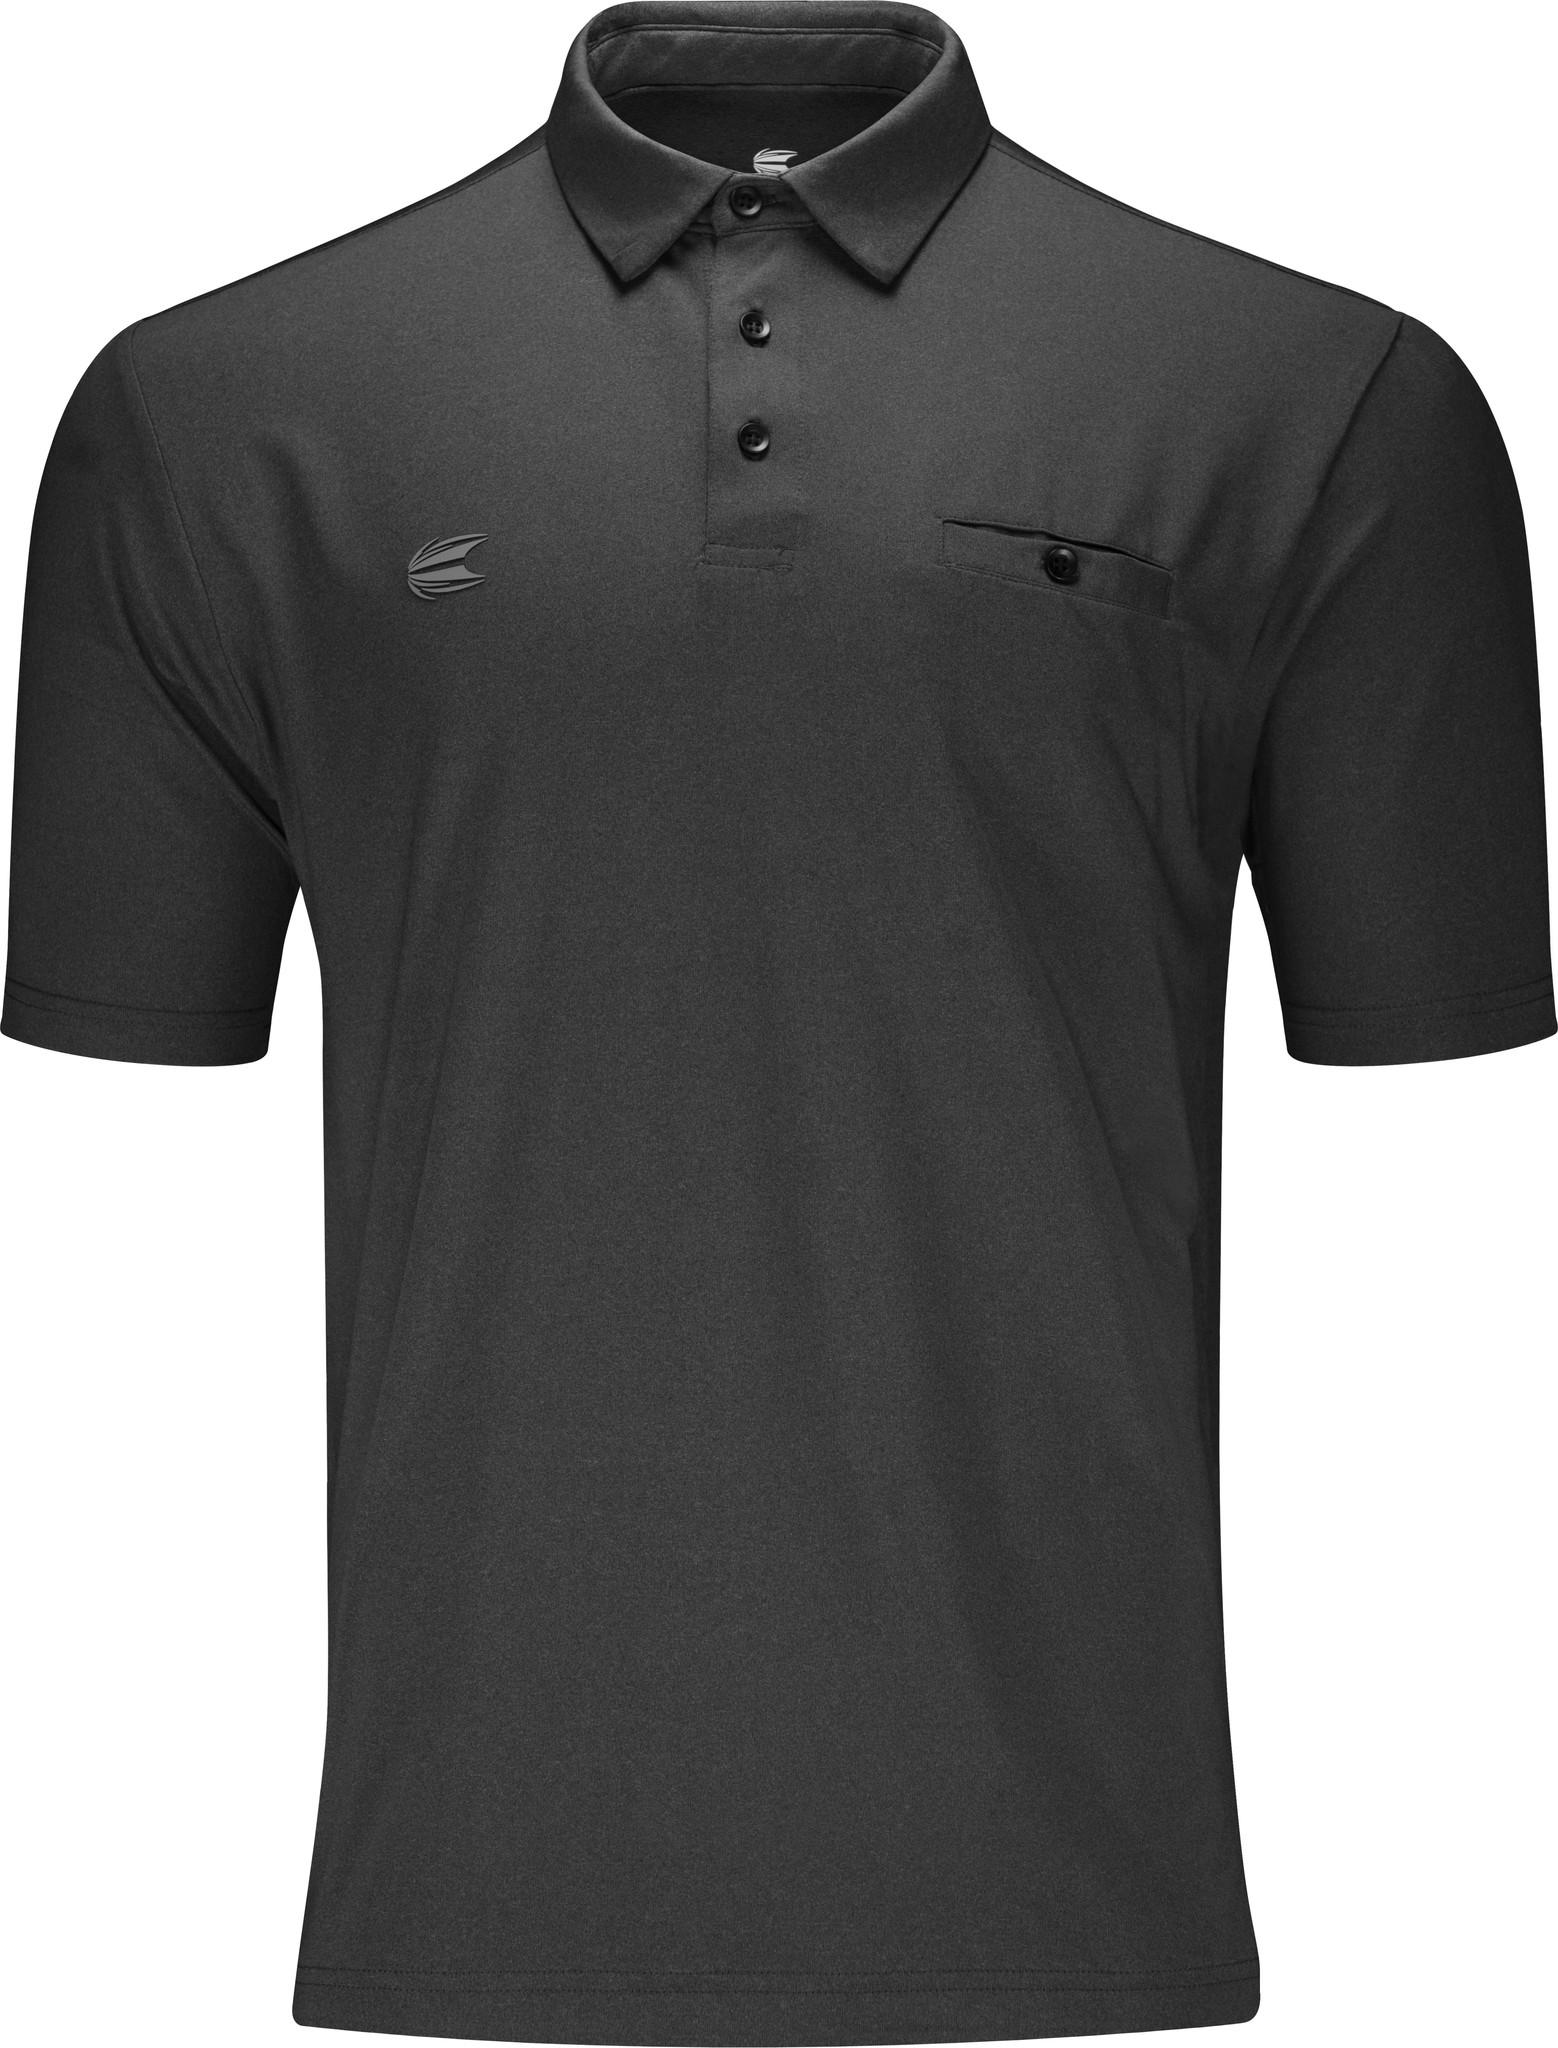 SALE: 30% - Target Flexline Shirt Dark Grey